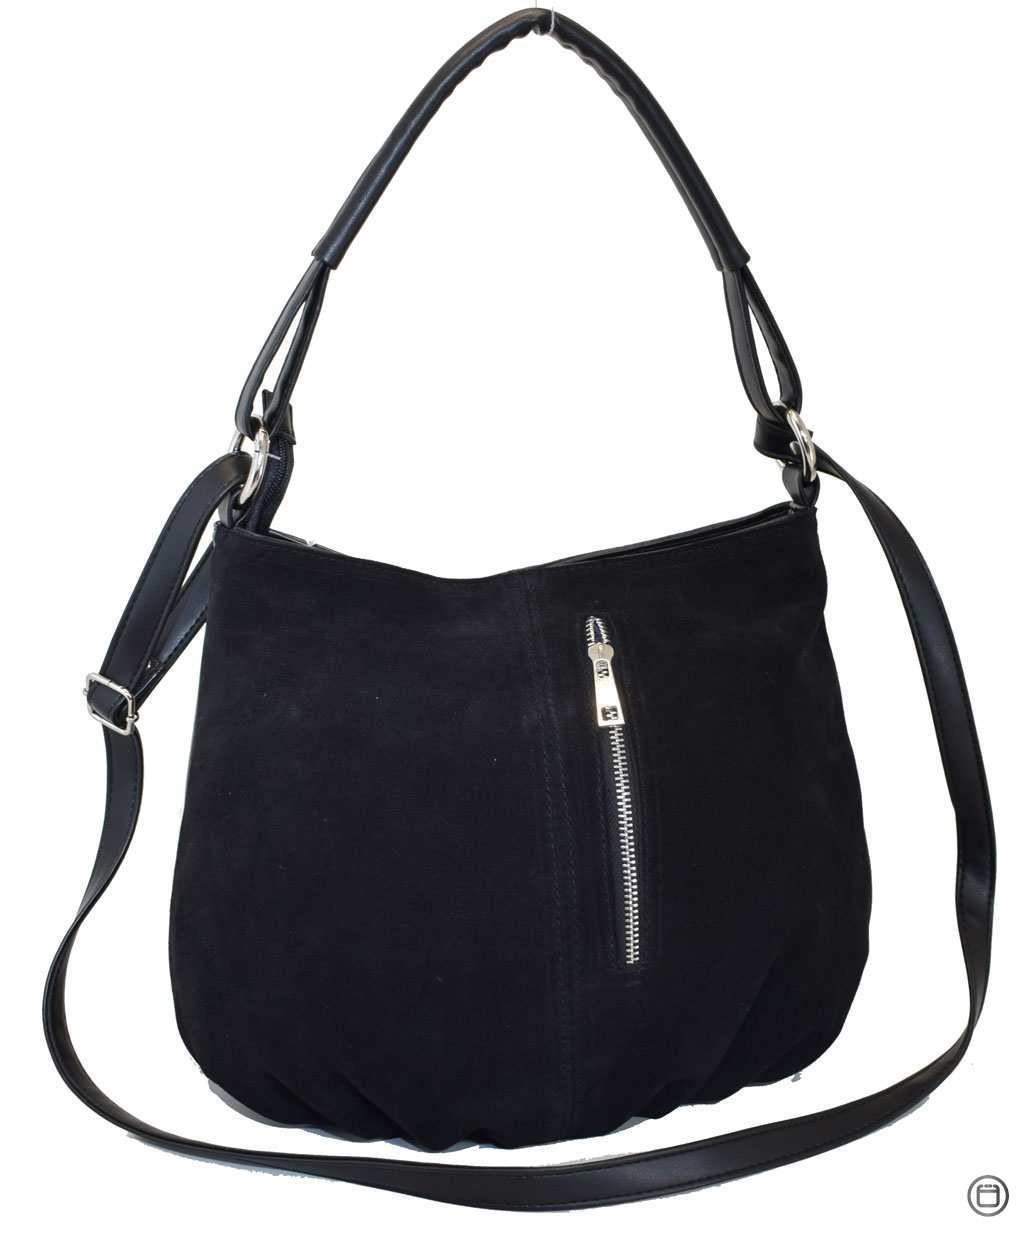 Женская замшевая сумка Case 273 черная